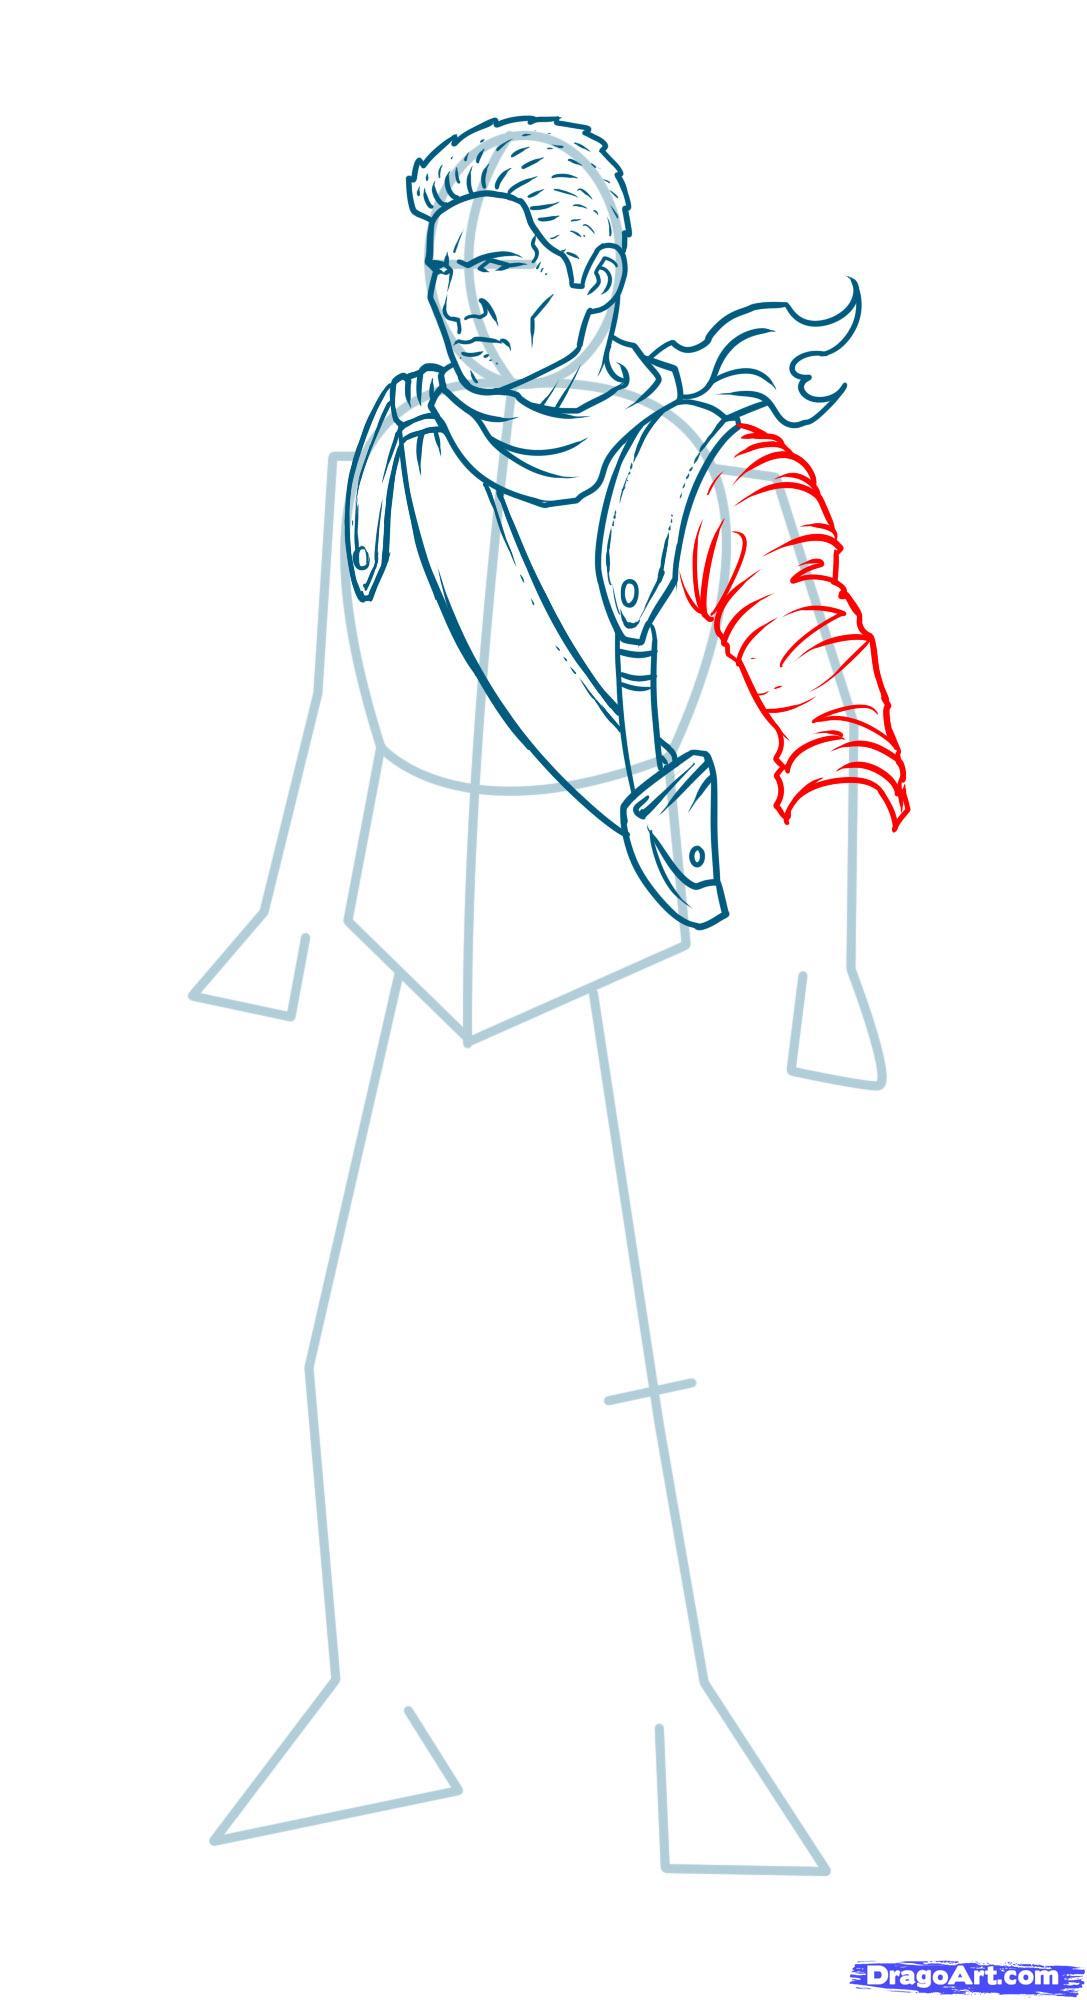 Как нарисовать Nathan Drake из Uncharted карандашом поэтапно